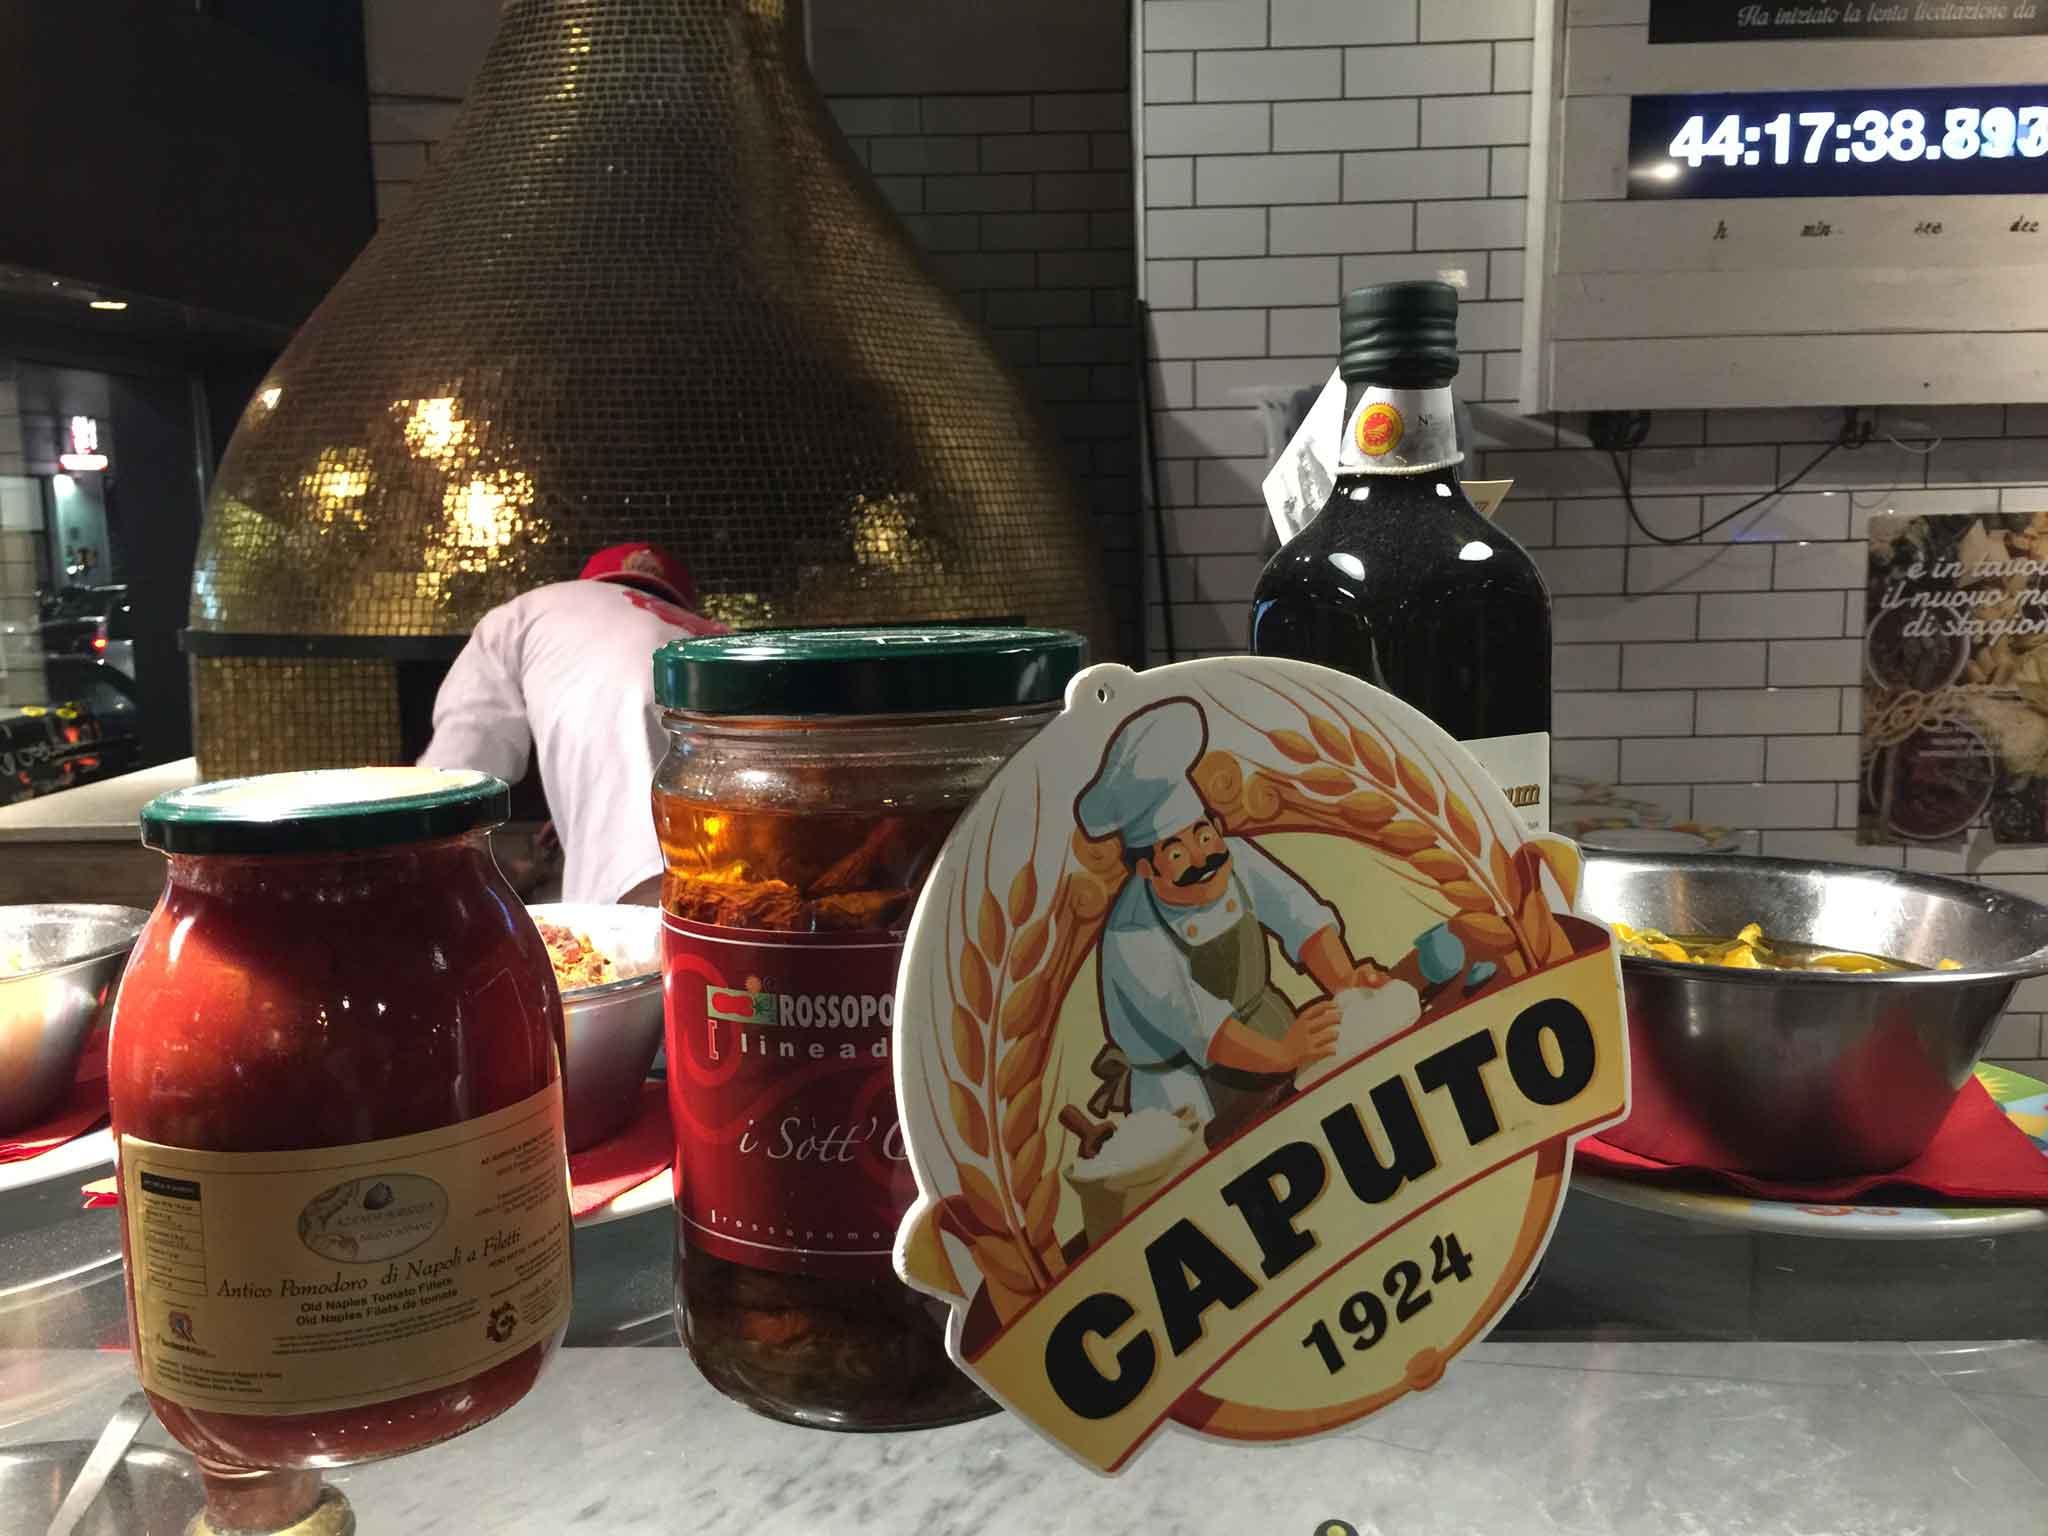 farina Caputo e pomodori per pizza napoletana